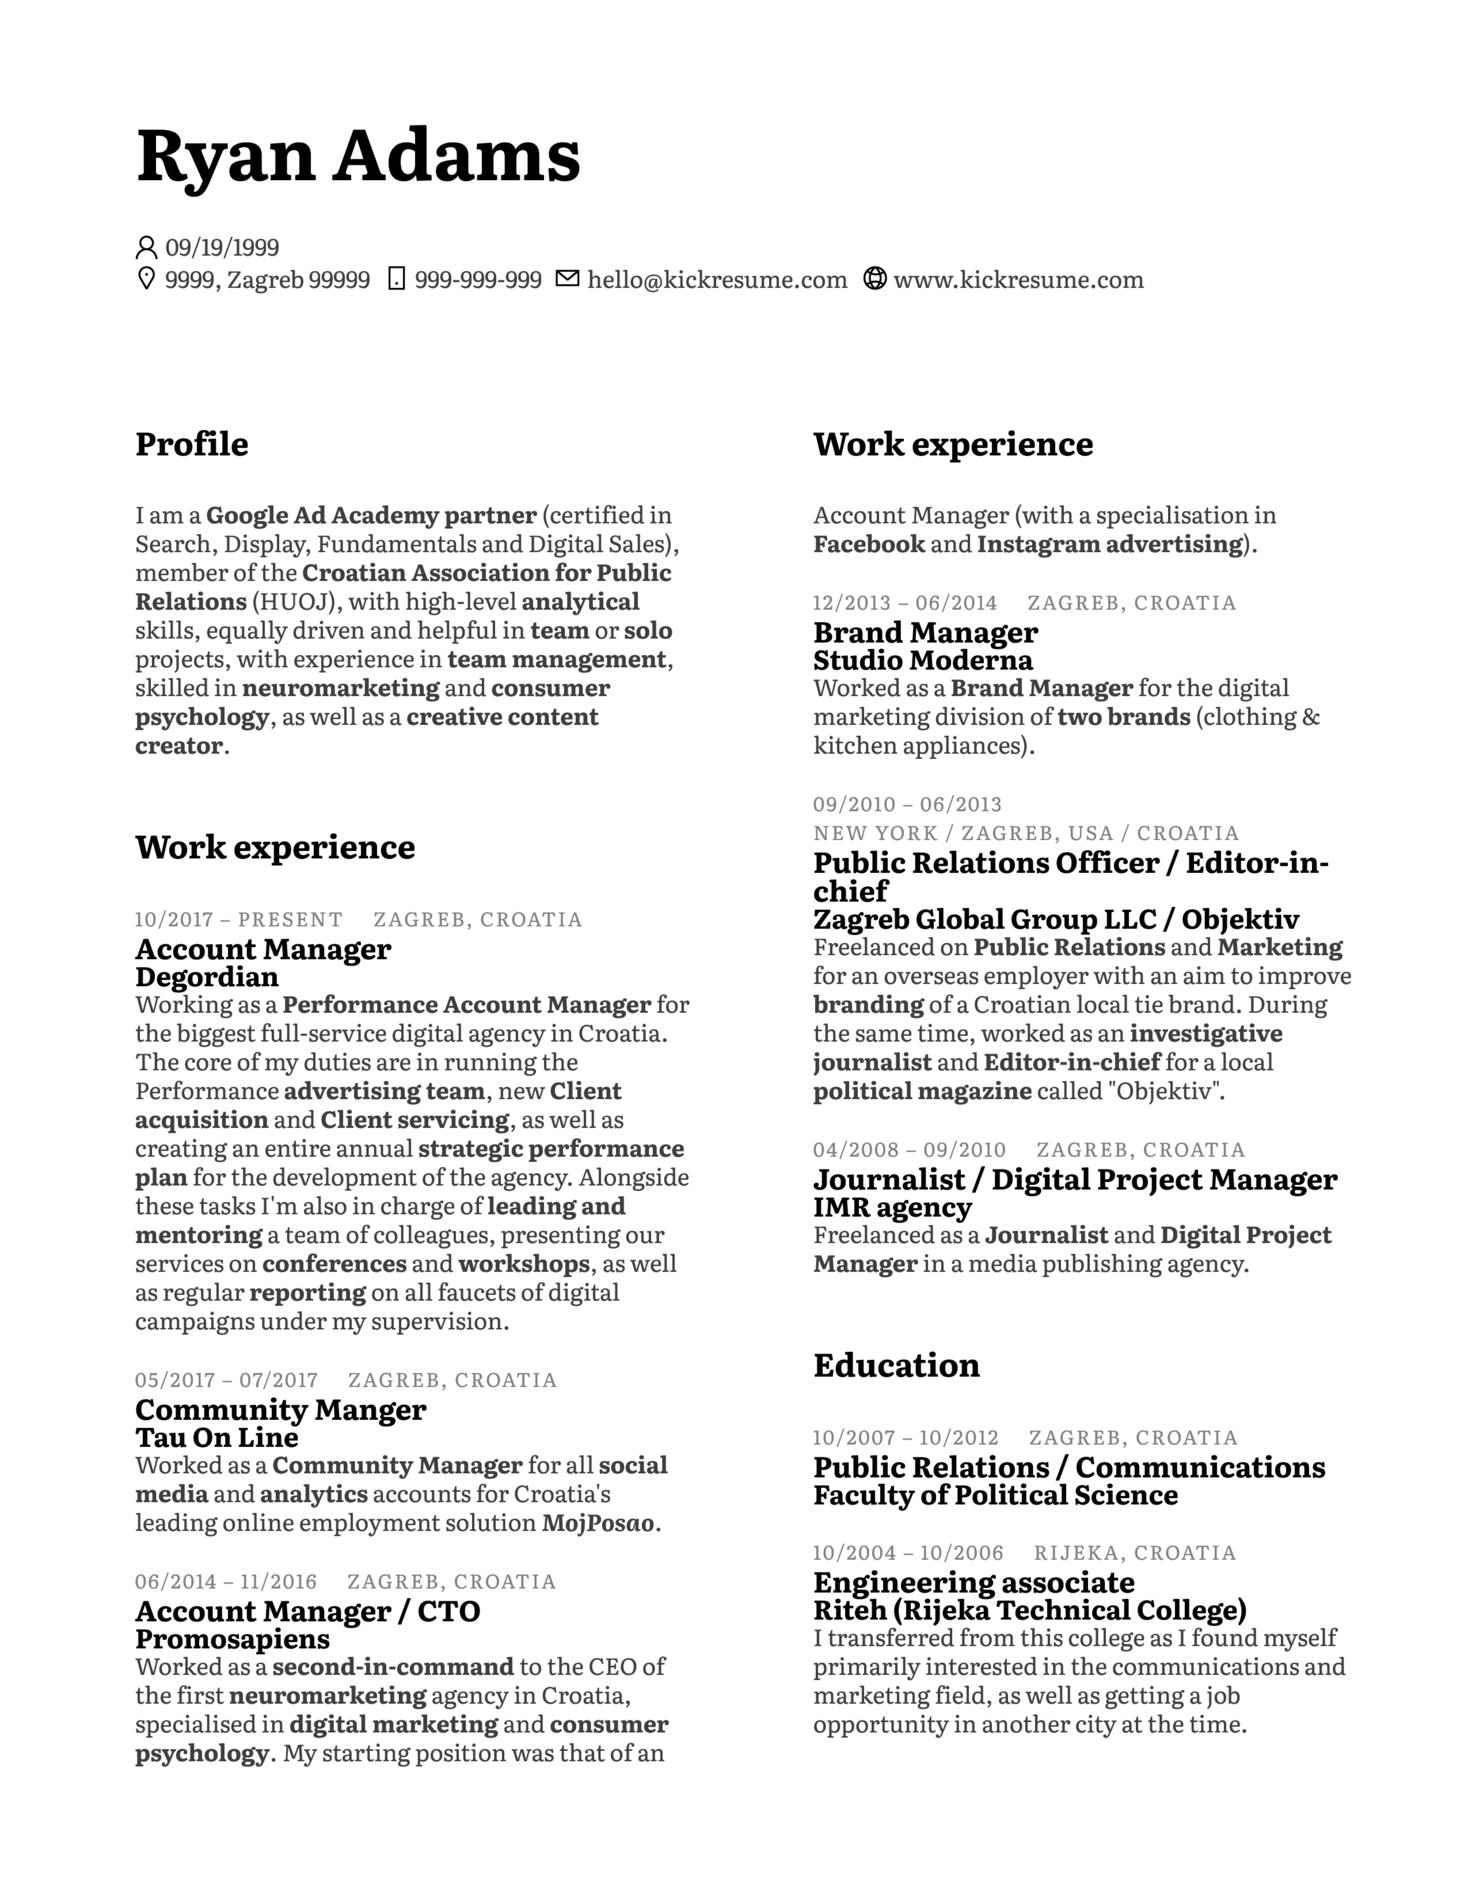 Senior Marketing Analyst CV Example (Part 1)